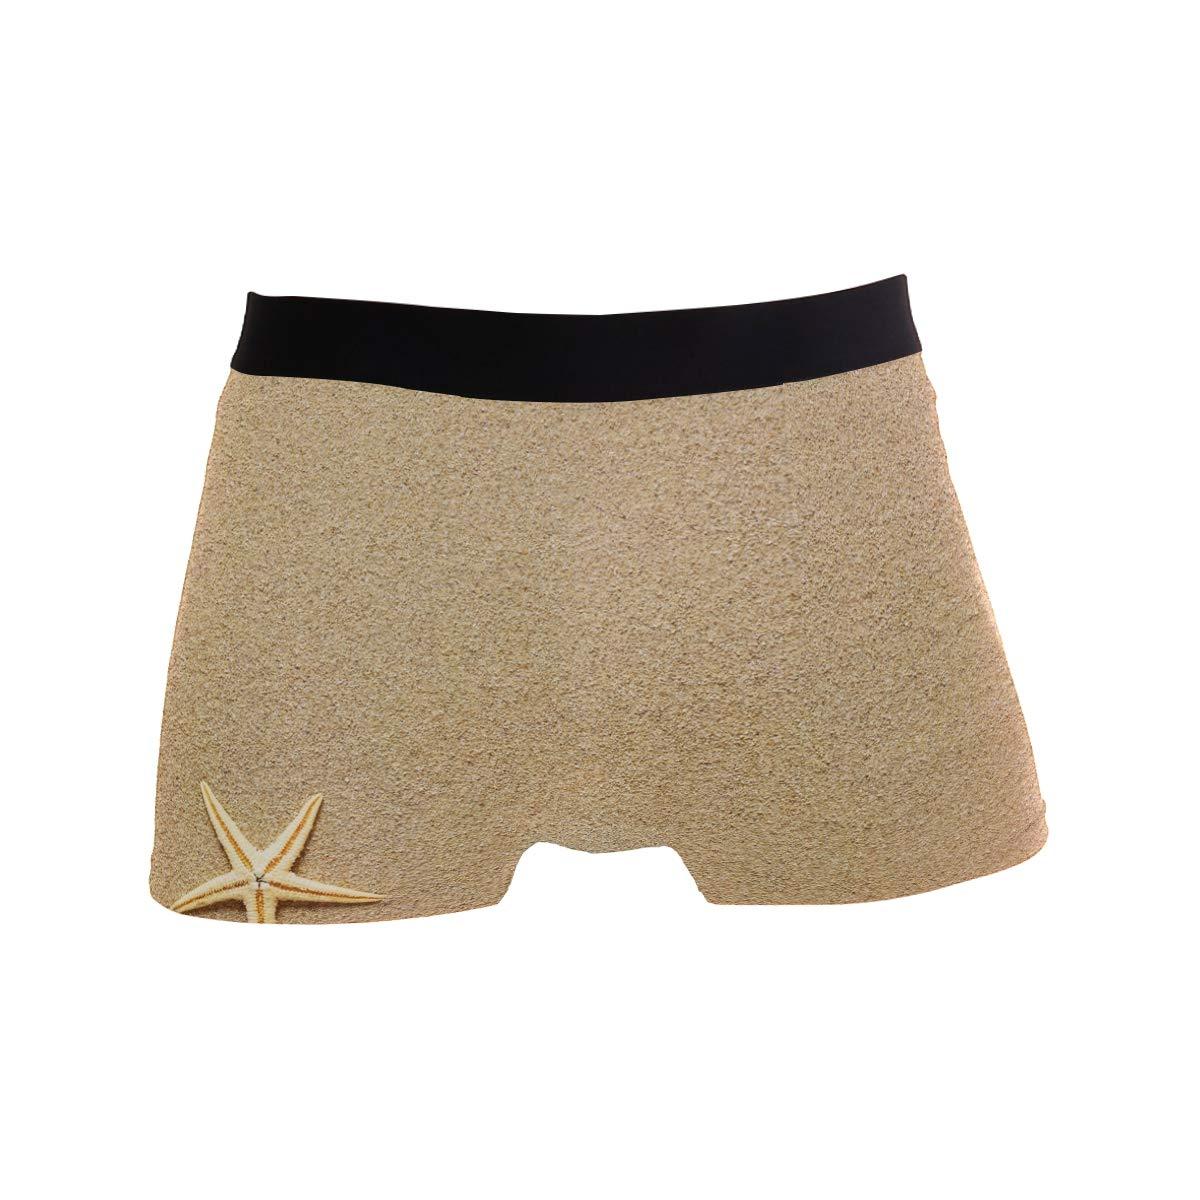 Jereee Beach Sand Shells Starfishes Mens Underwear Soft Polyester Boxer Brief for Men Adult Teen Children Kids S